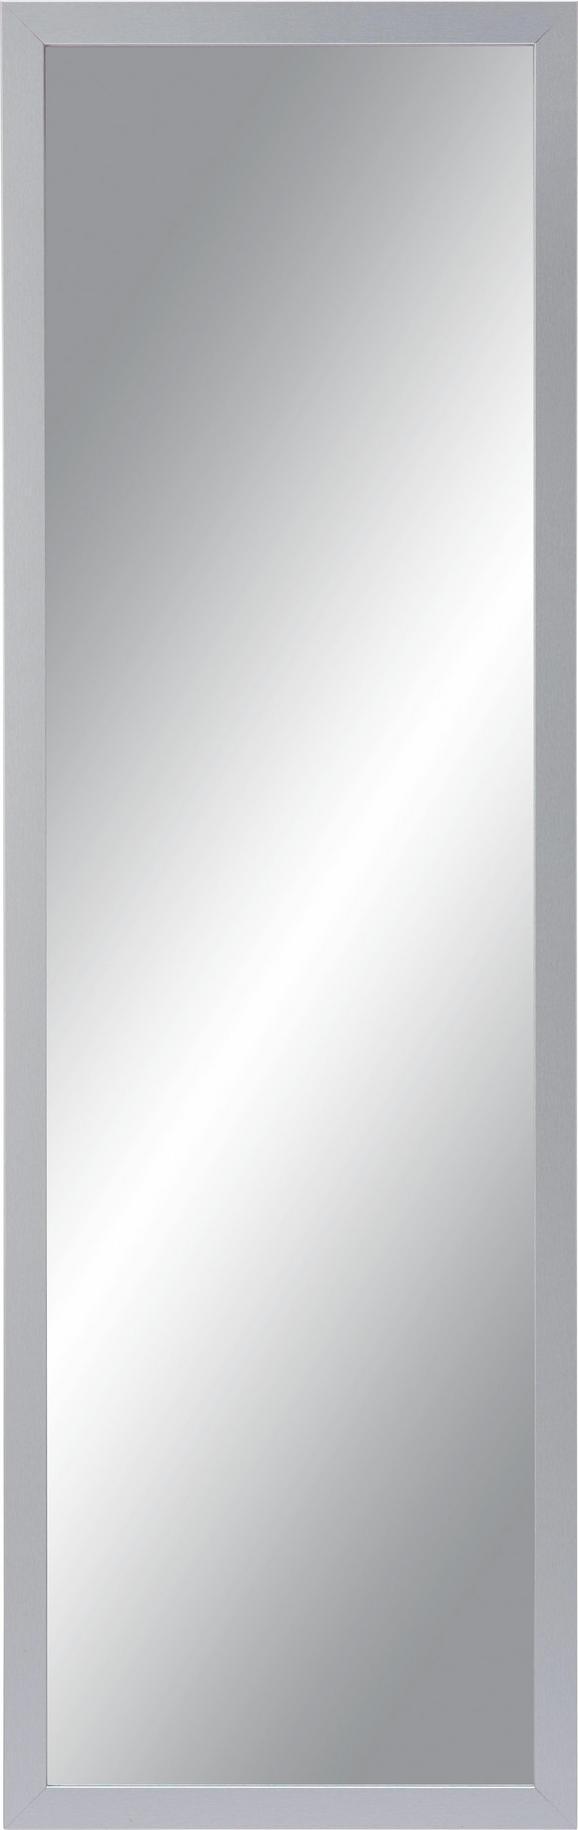 Wandspiegel ca. 50x150x2cm - Silberfarben, Glas/Holzwerkstoff (50/150/2cm)